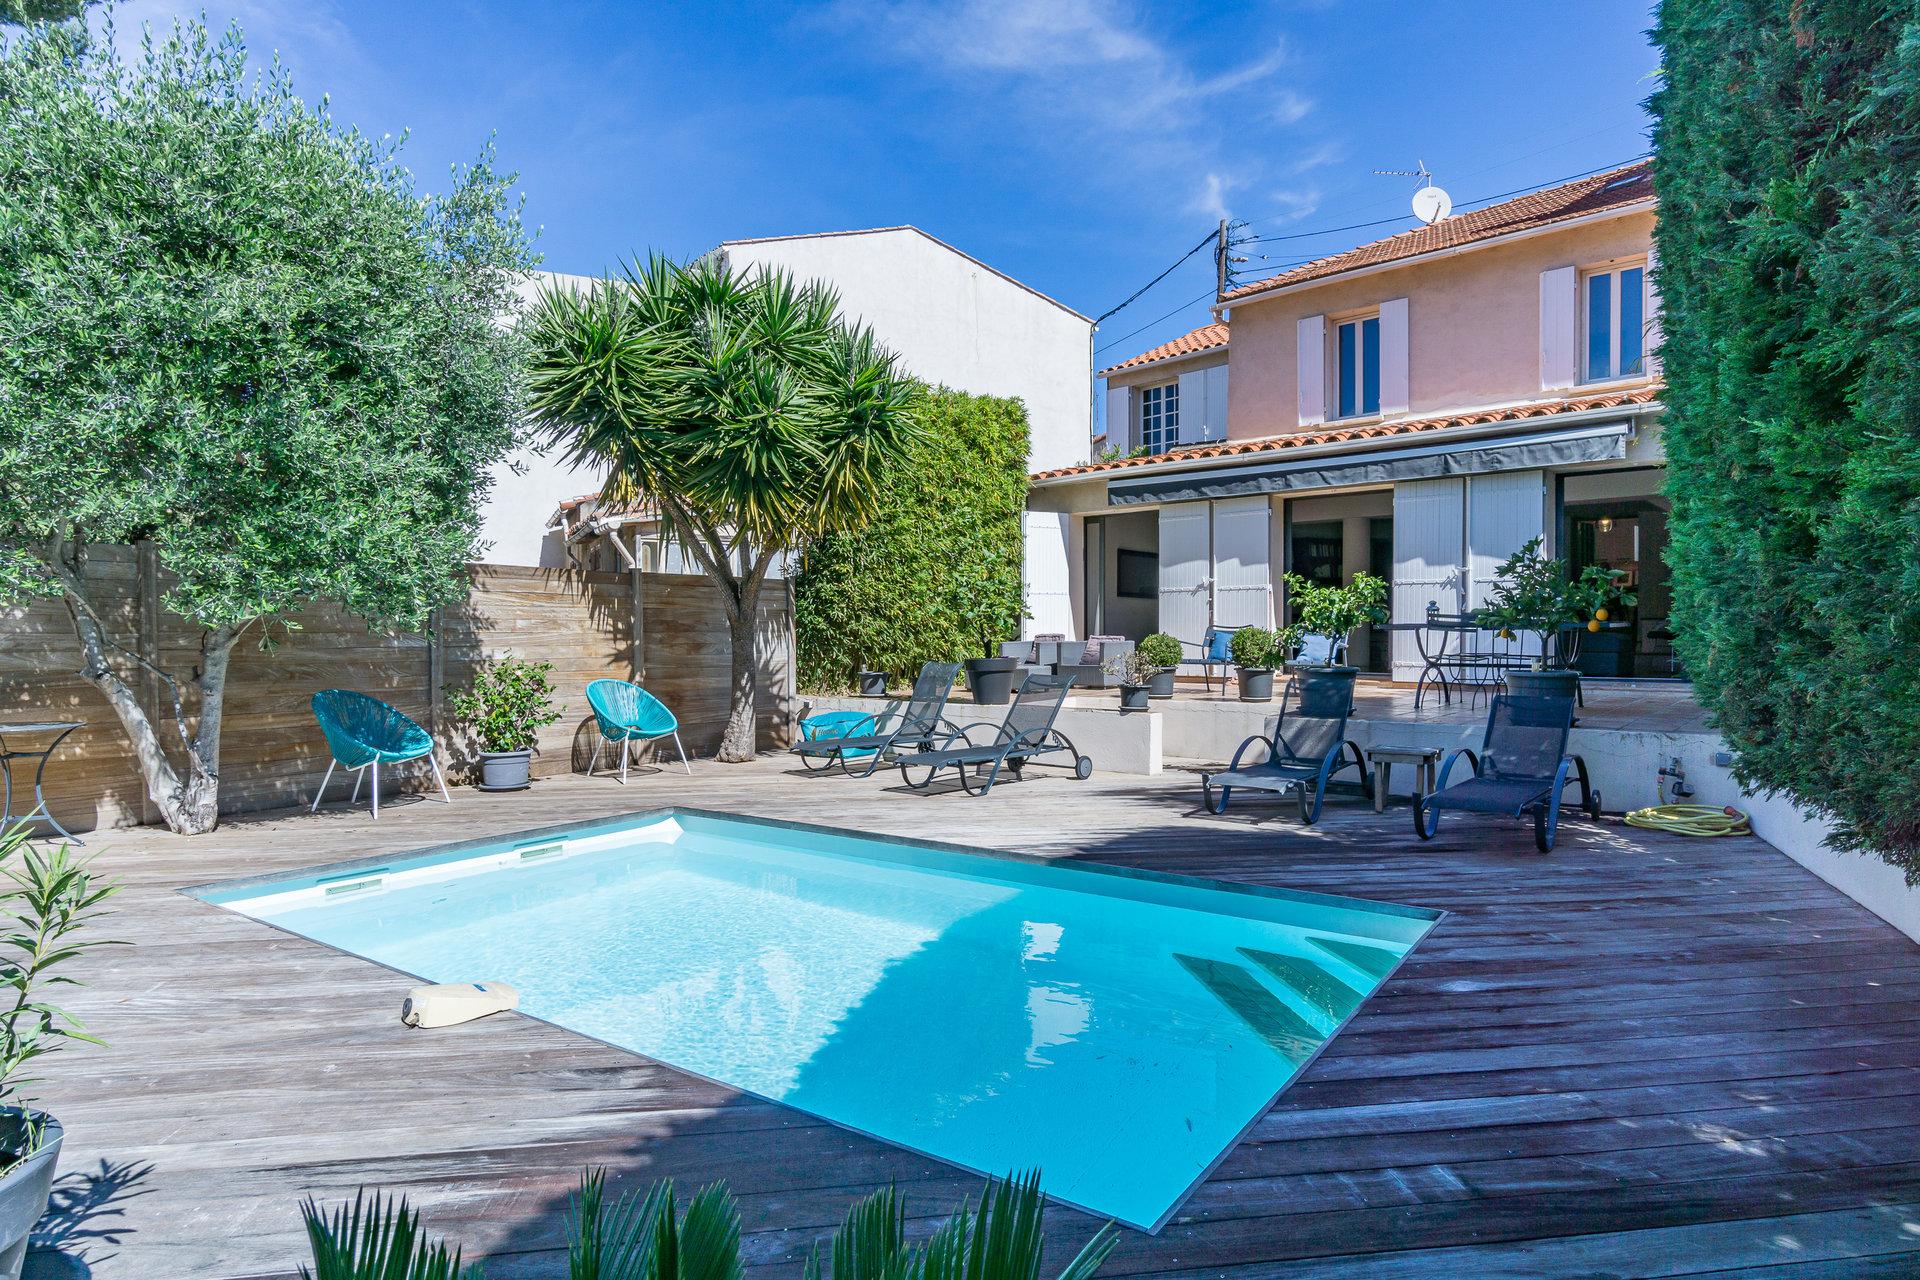 ROUCAS TERRAIL Maison T4 jardin piscine garage 13007